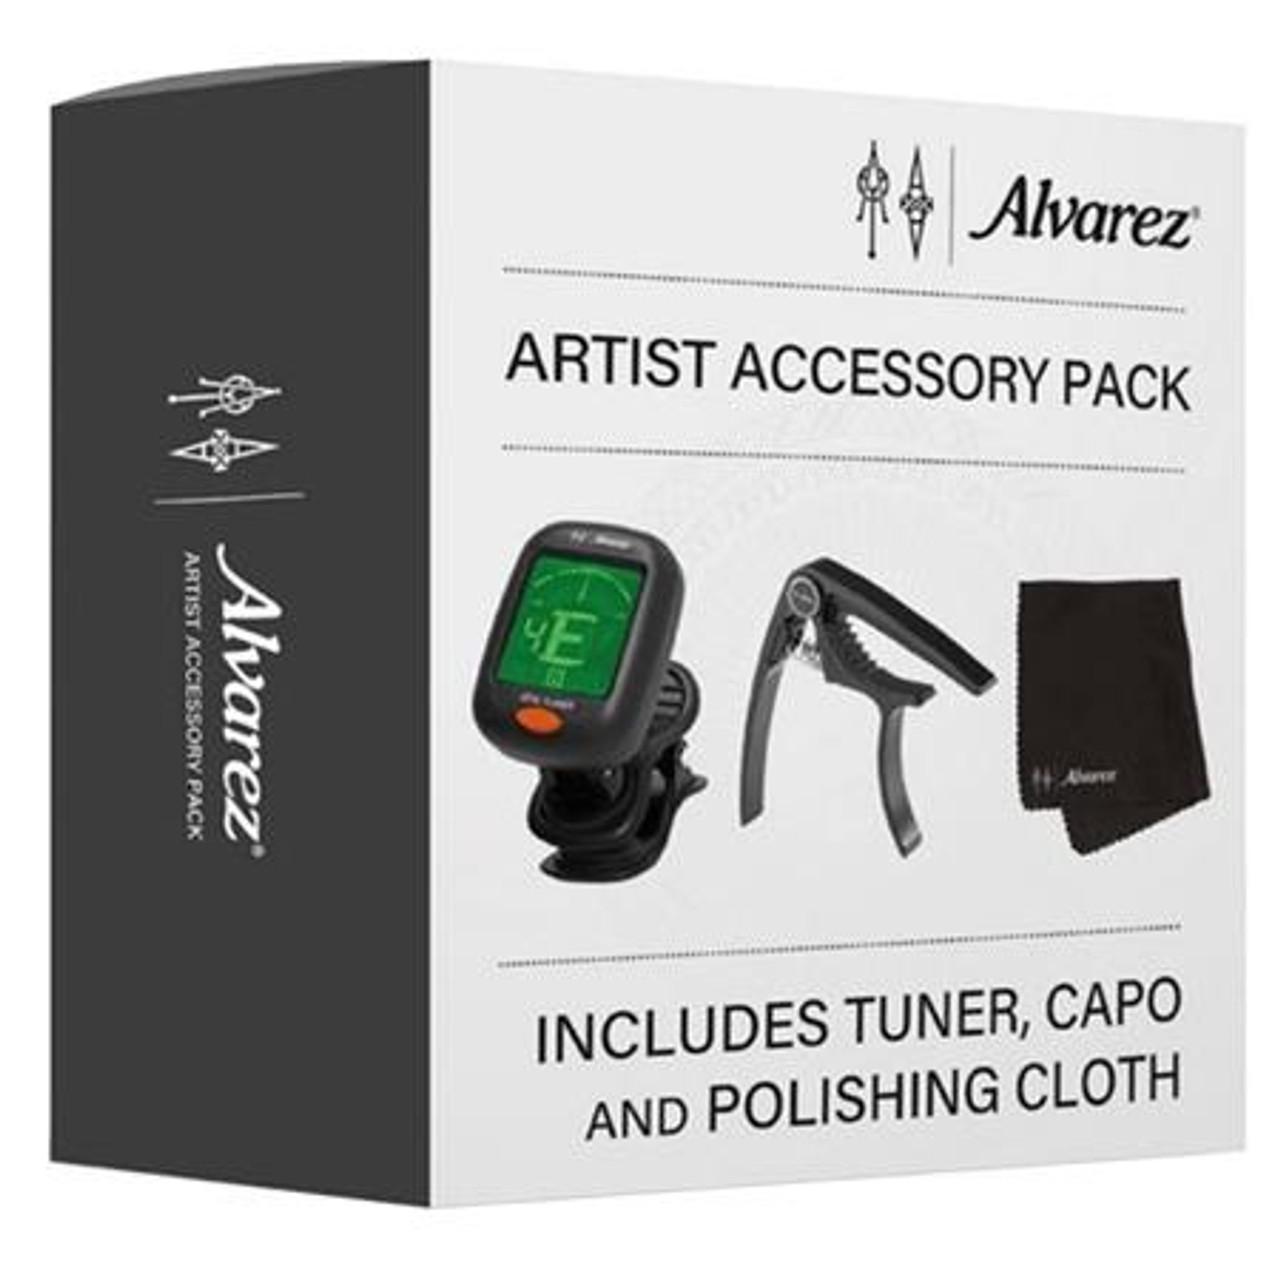 Alvarez Artist Accessory Pack, Tuner, Capo, Polishing Cloth